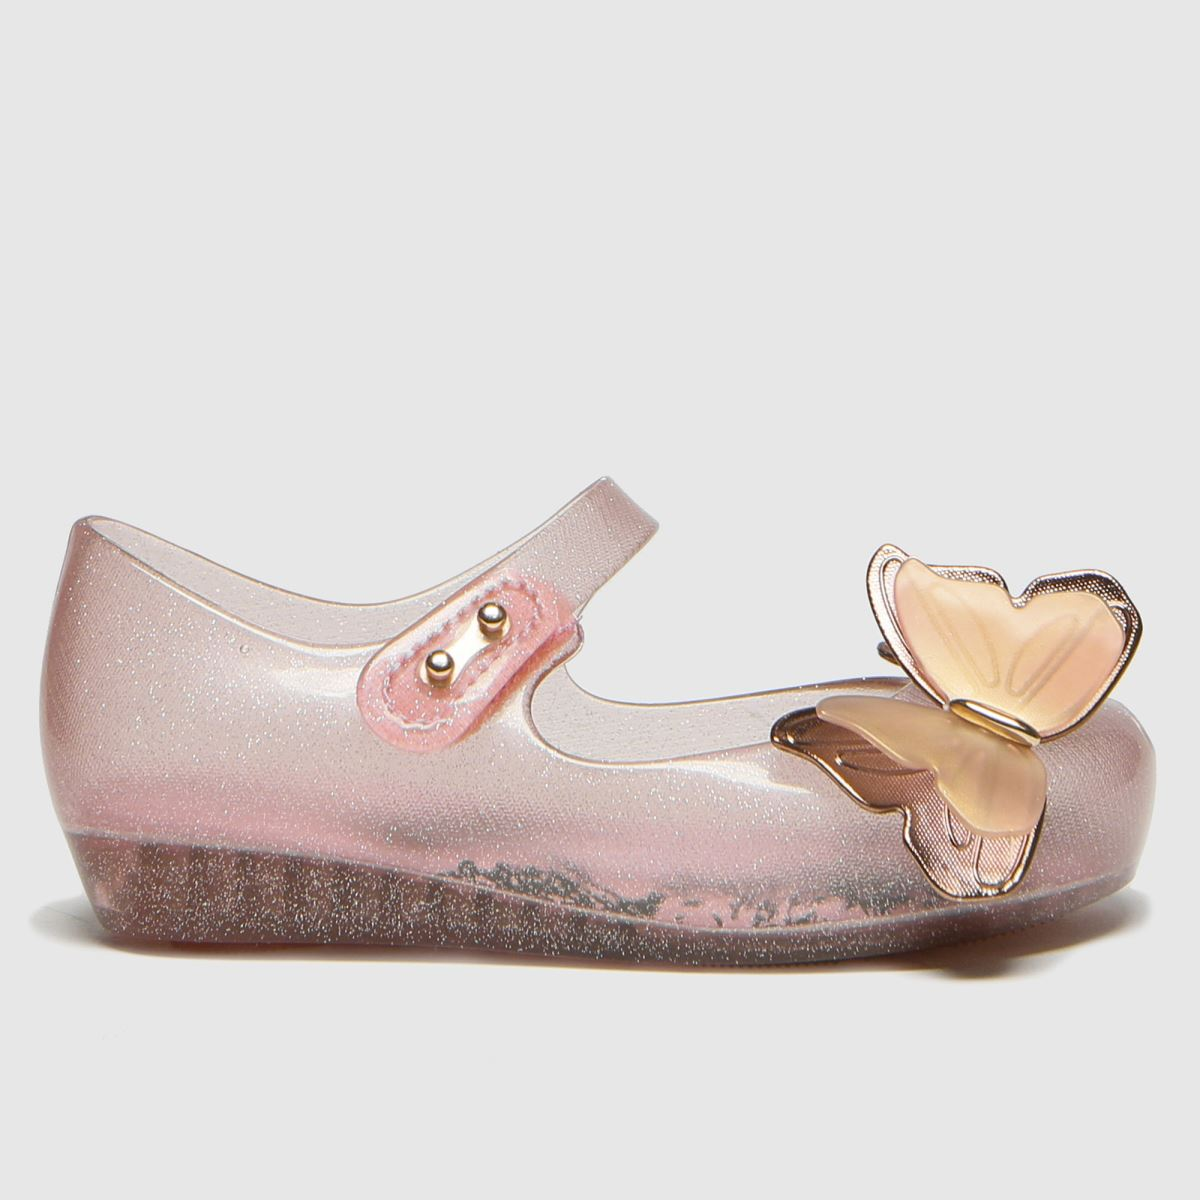 Melissa Pale Pink Ultragirl Butterfly Boots Toddler